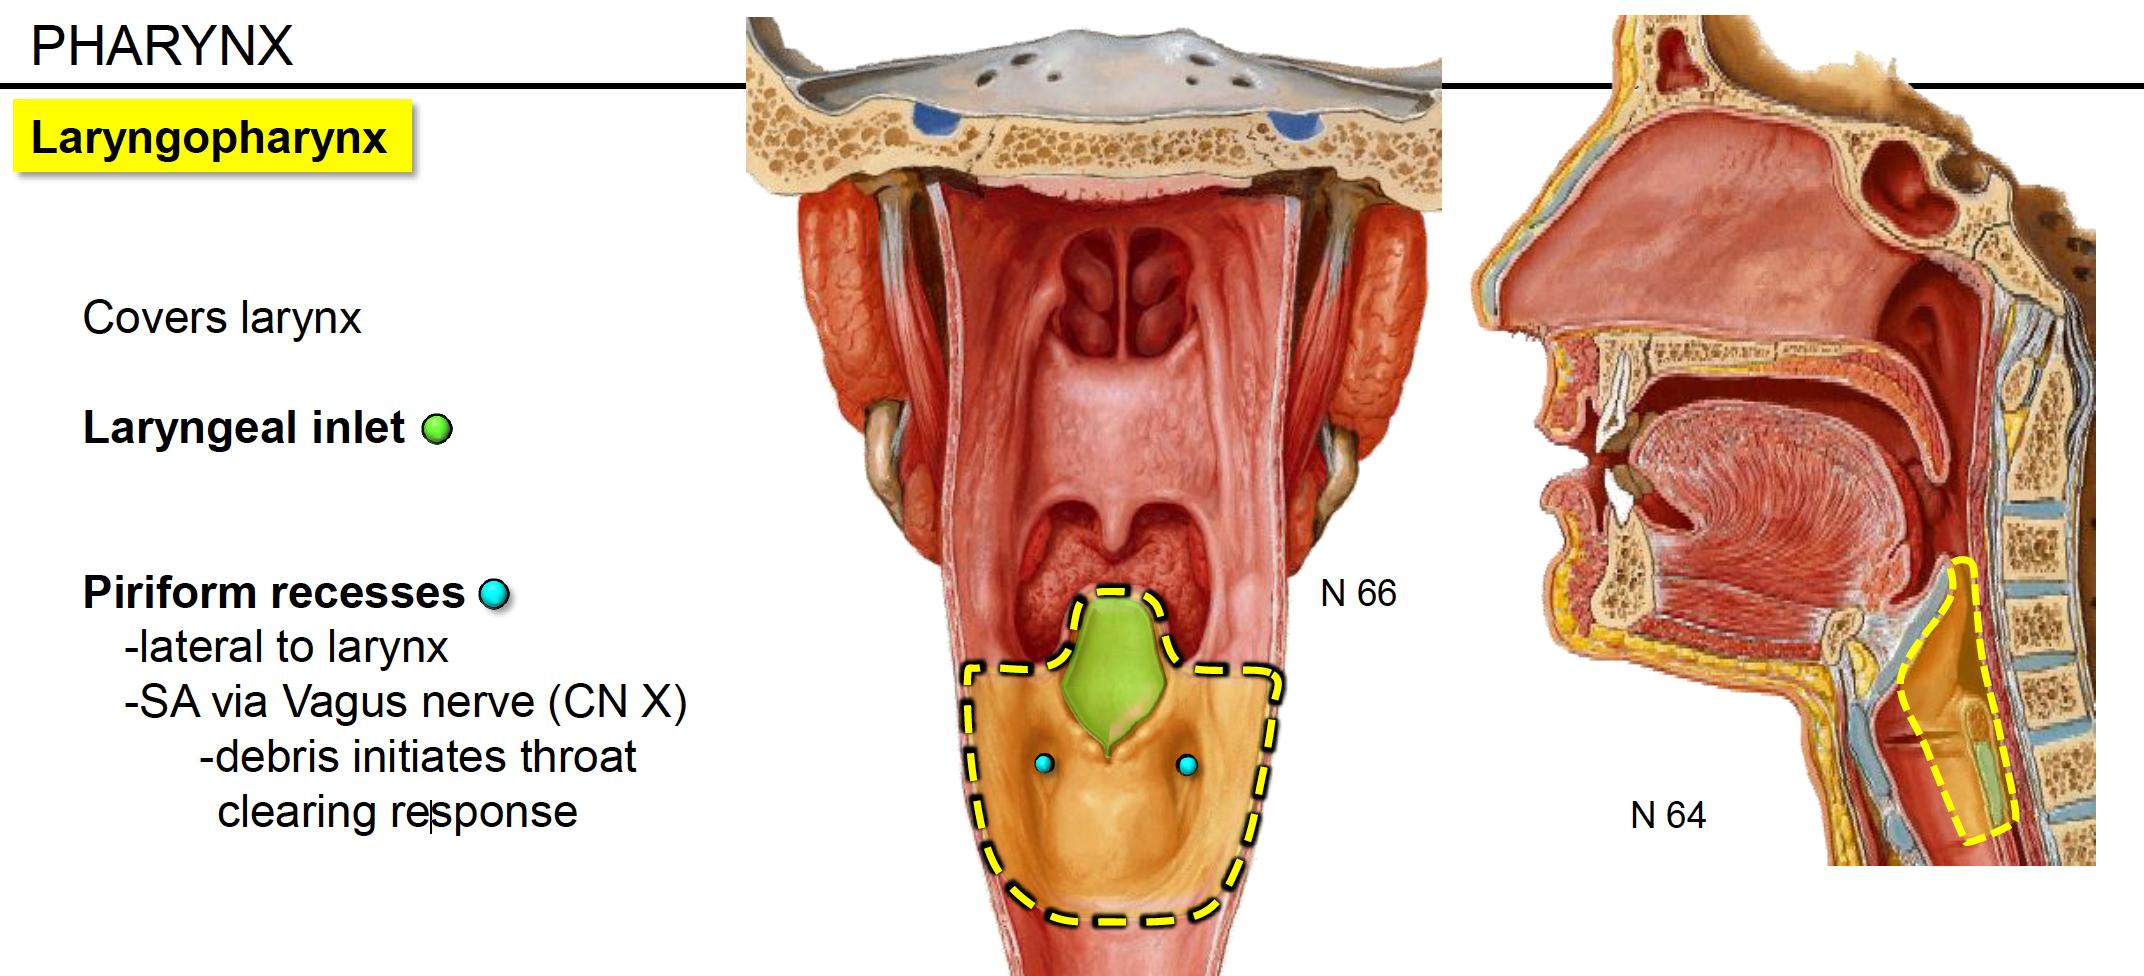 Anatomy G62 Pharynx And Palate Anatomy Unit 8 Flashcards Memorang